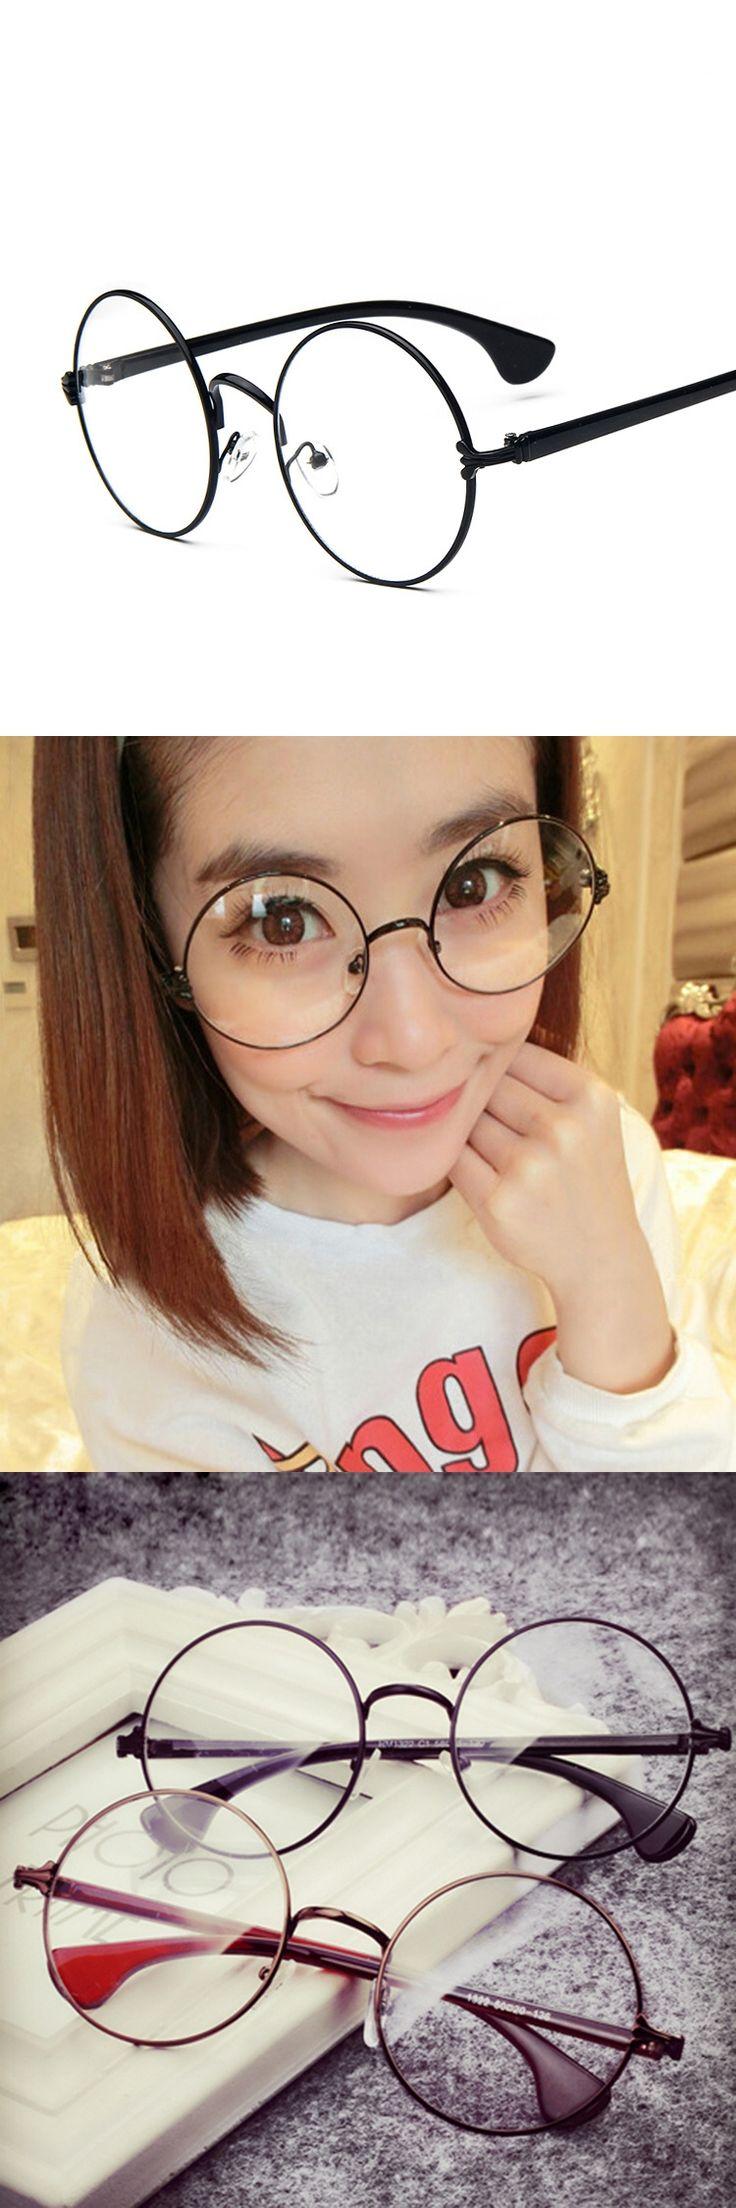 2017 New Retro Matal Glasses Frame Women Men Big Round Eyeglasses Optical Eye Glasses Frames Brand Eyewear Lentes opticos mujer